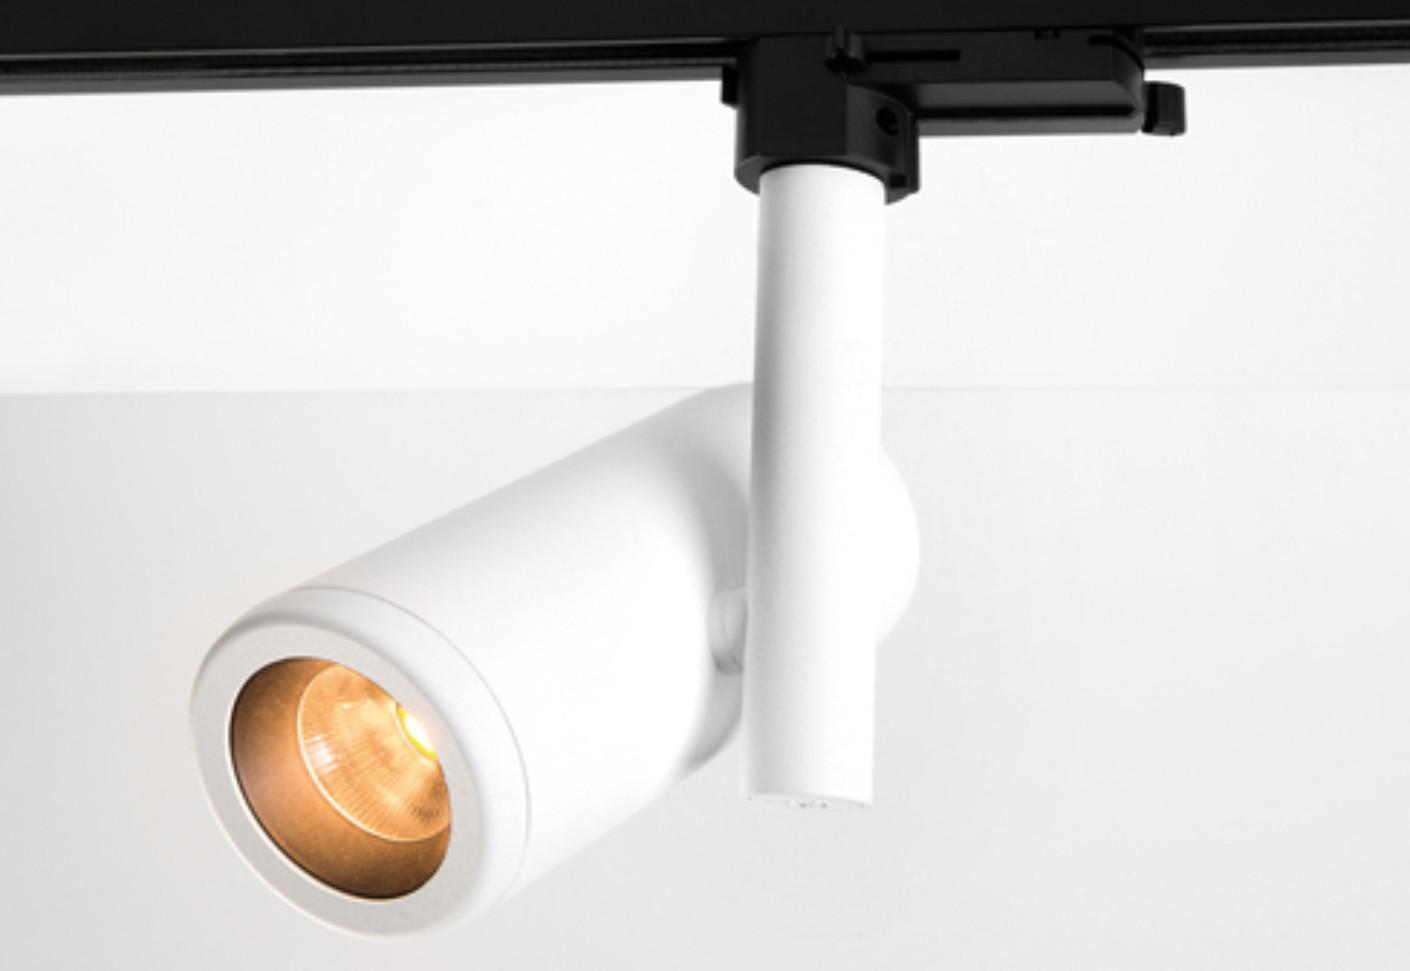 Modular Lighting Instruments - Democraciaejustica